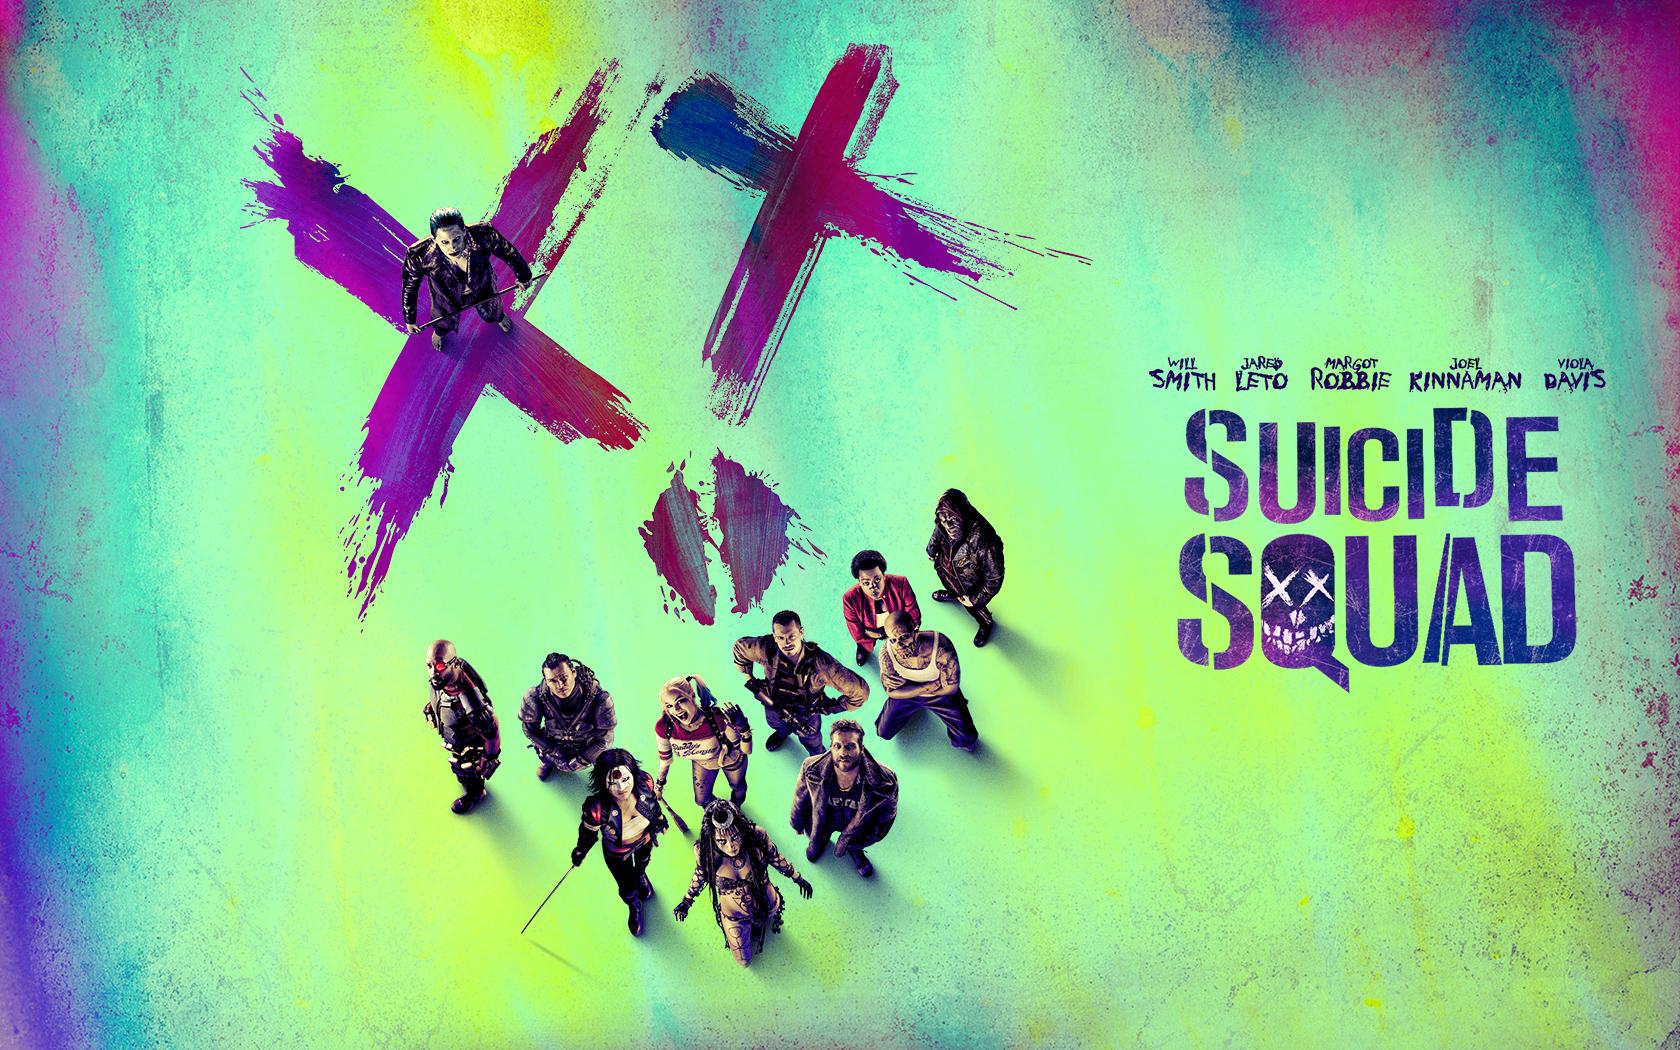 Suicide Squad Poster Wallpaper   Suicide Squad Wallpaper 39721674 1680x1050